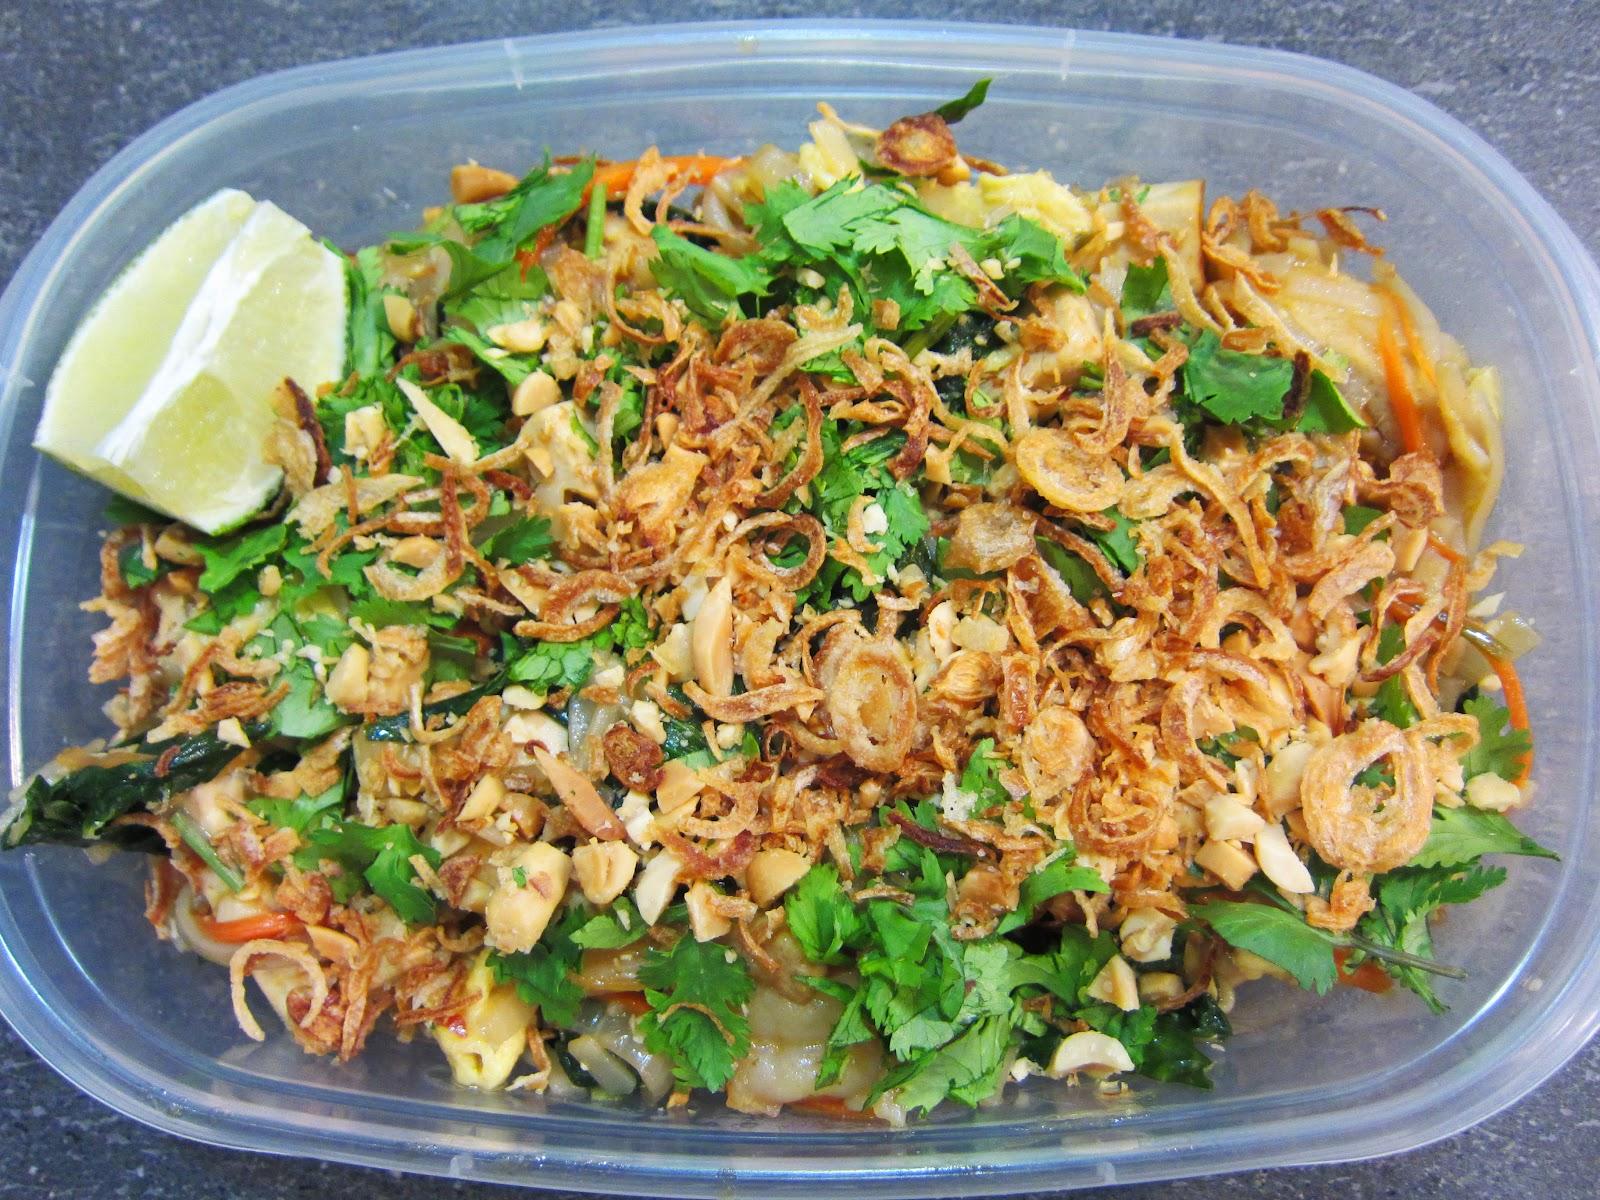 Tasty Eating: Lunch Week 24: Shrimp Pad Thai